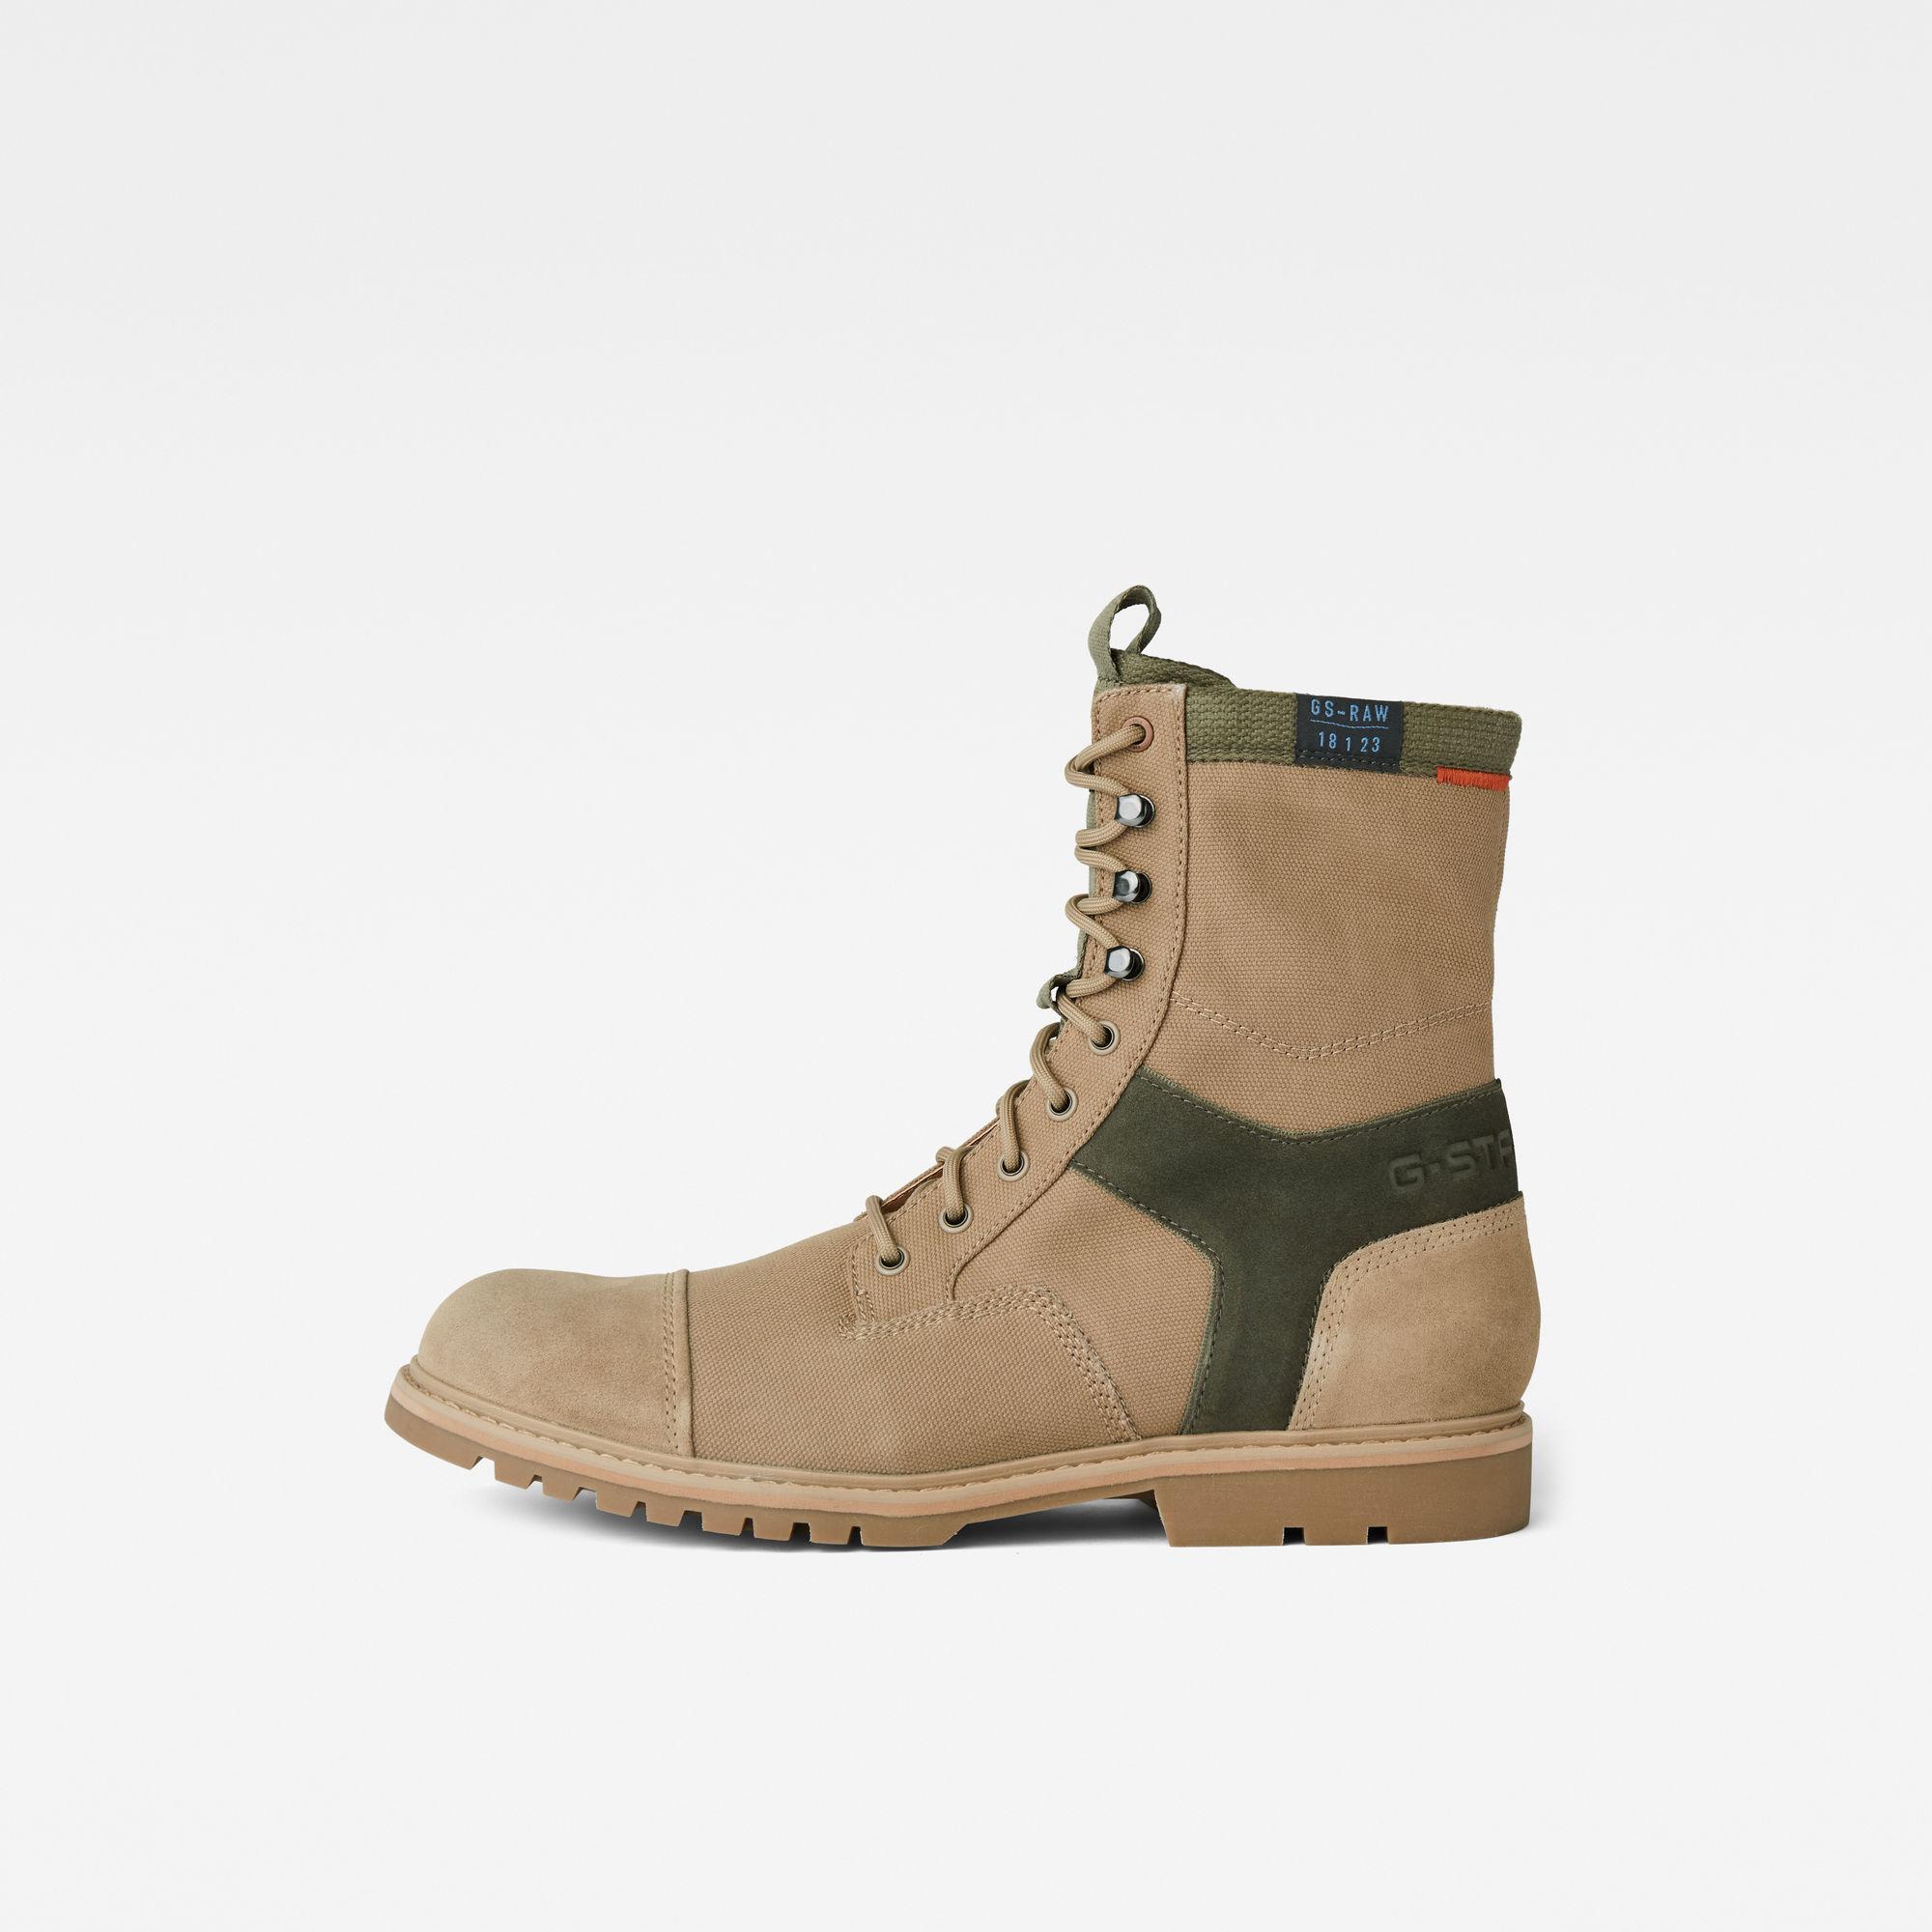 G-Star RAW Heren Tendric II Boots Beige